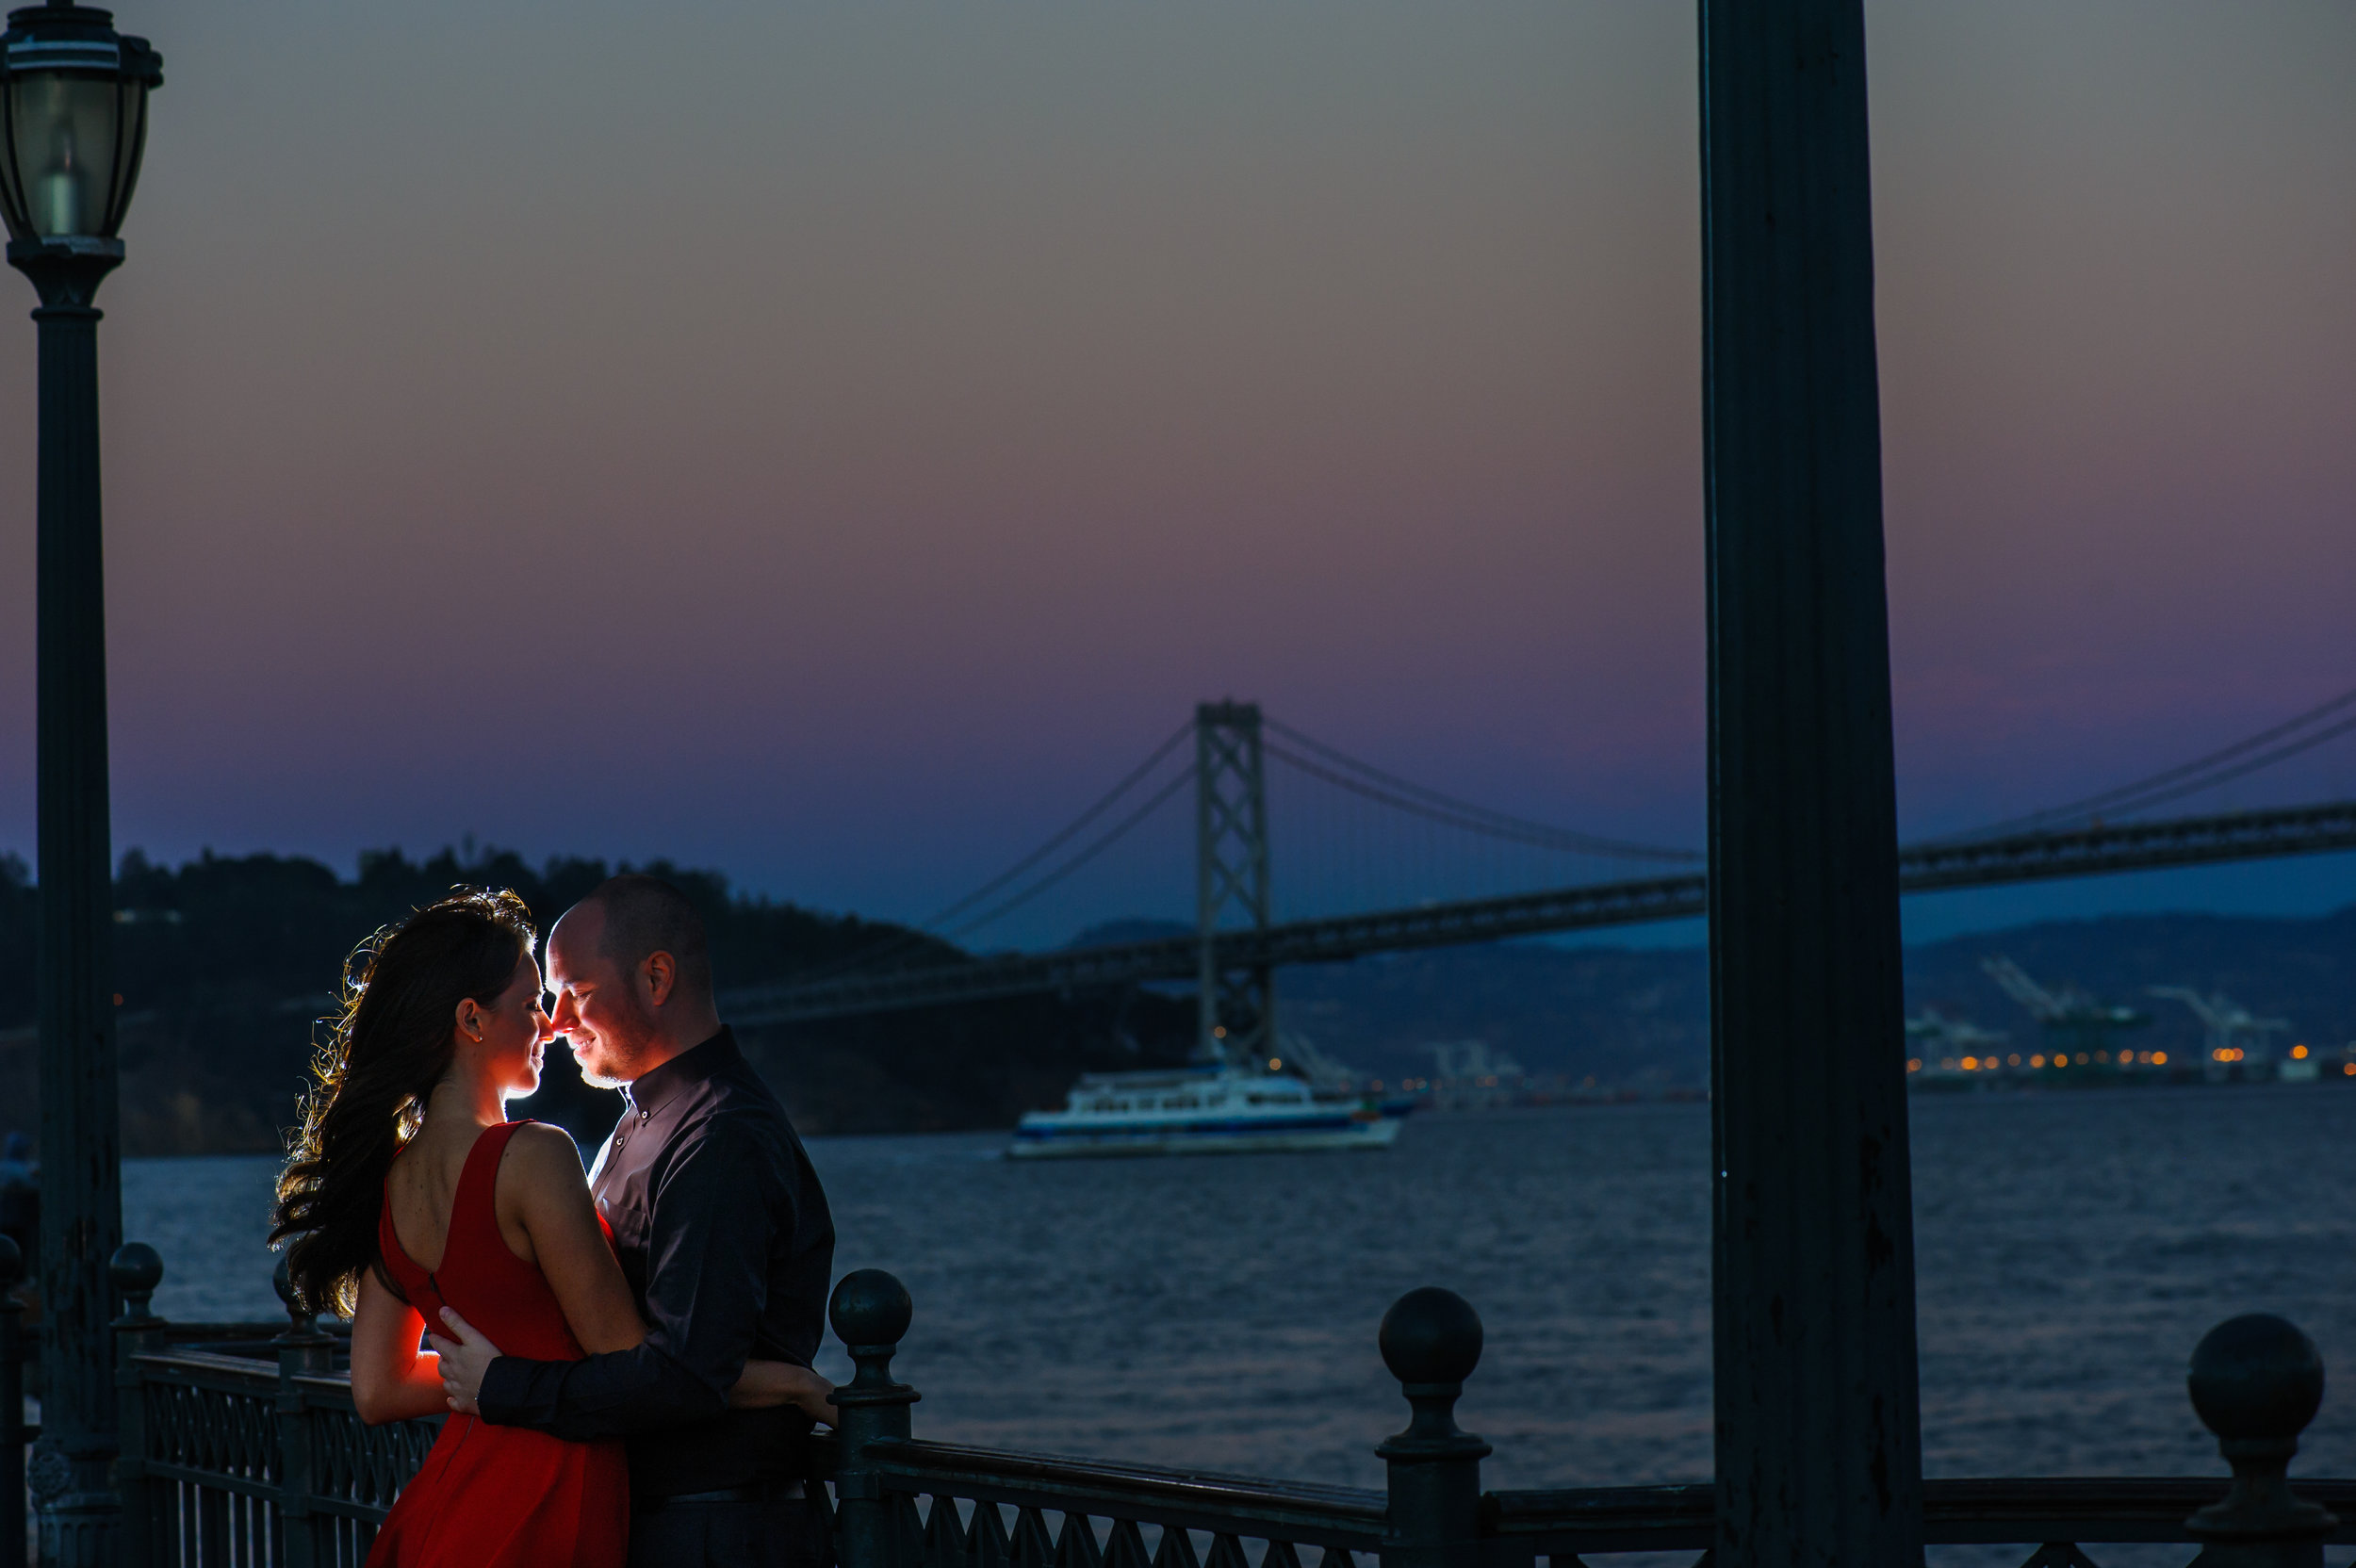 jenny-sean-030-san-francisco-engagement-sacramento-wedding-photographer-katherine-nicole-photography.JPG